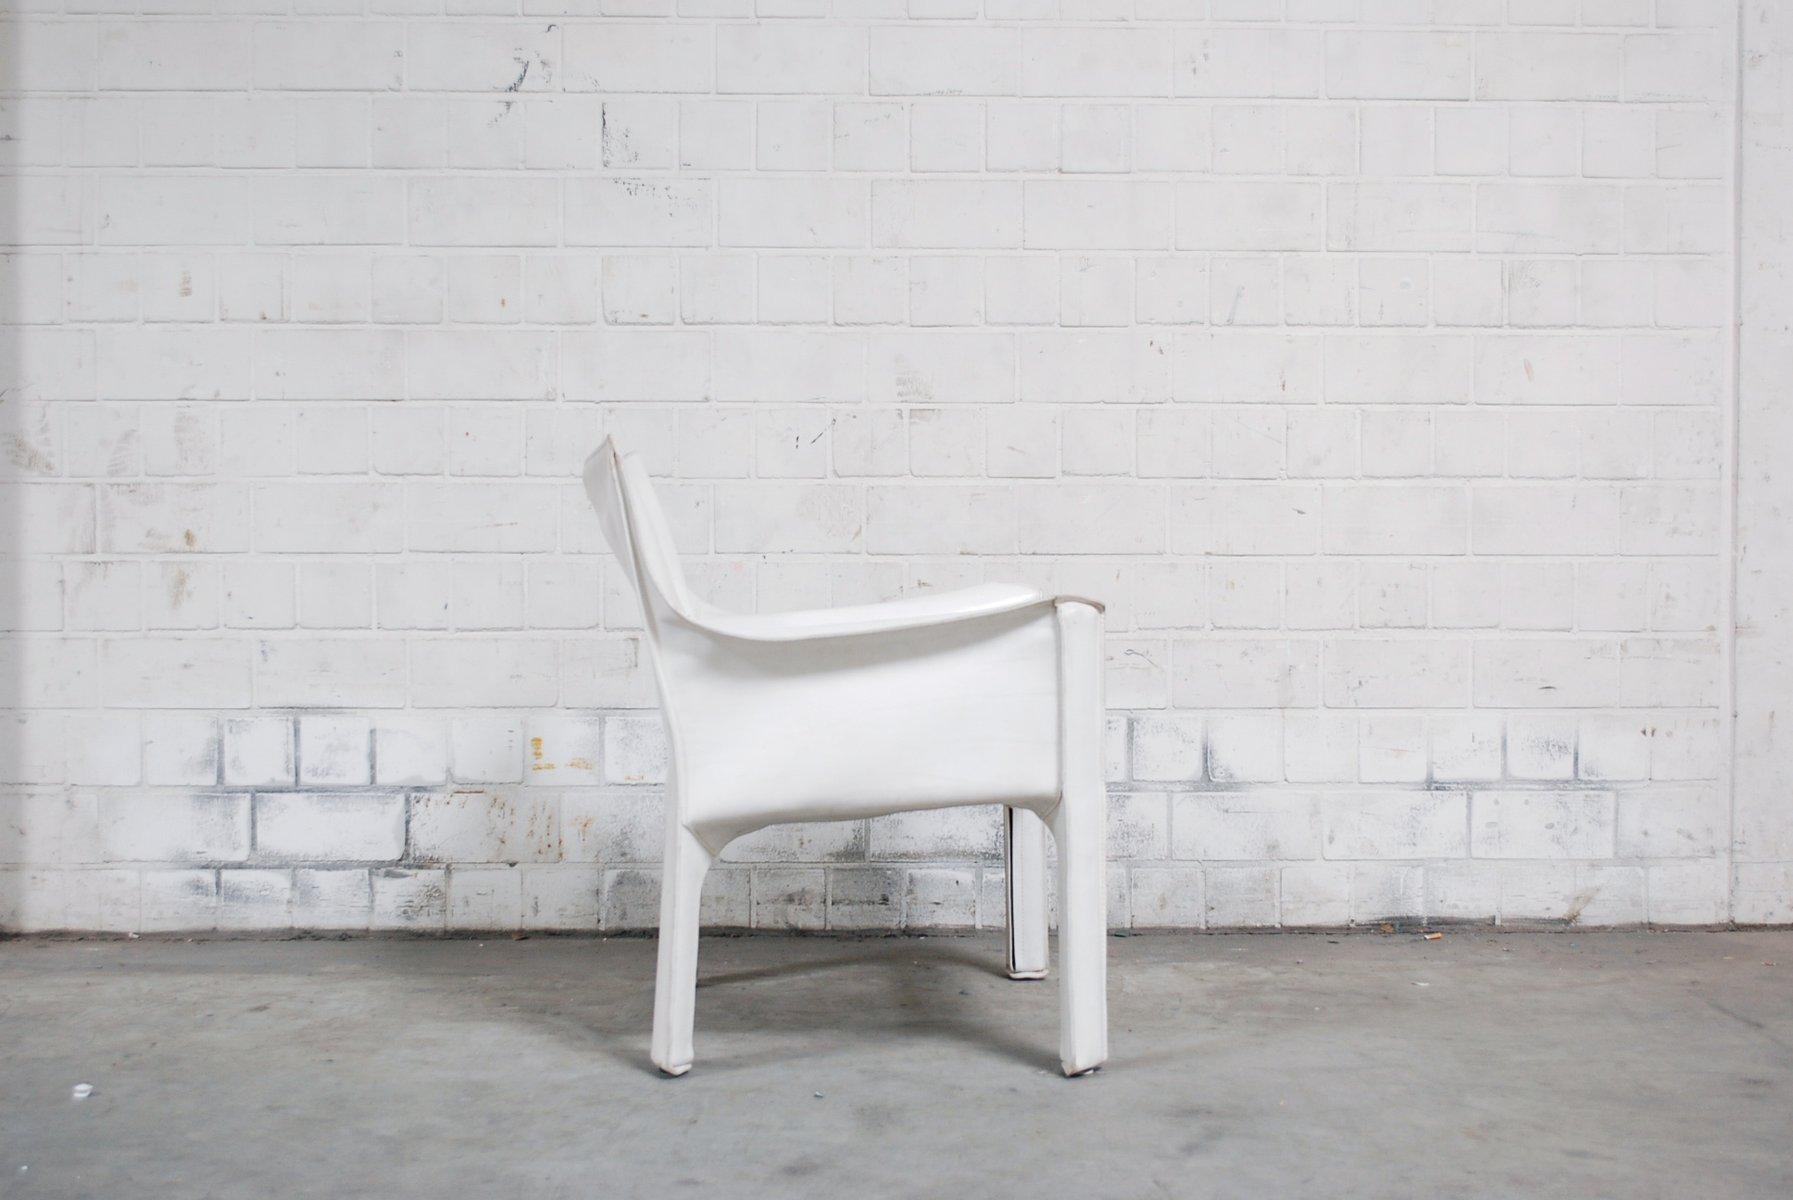 wei er vintage cab 414 armlehnstuhl von mario bellini f r. Black Bedroom Furniture Sets. Home Design Ideas